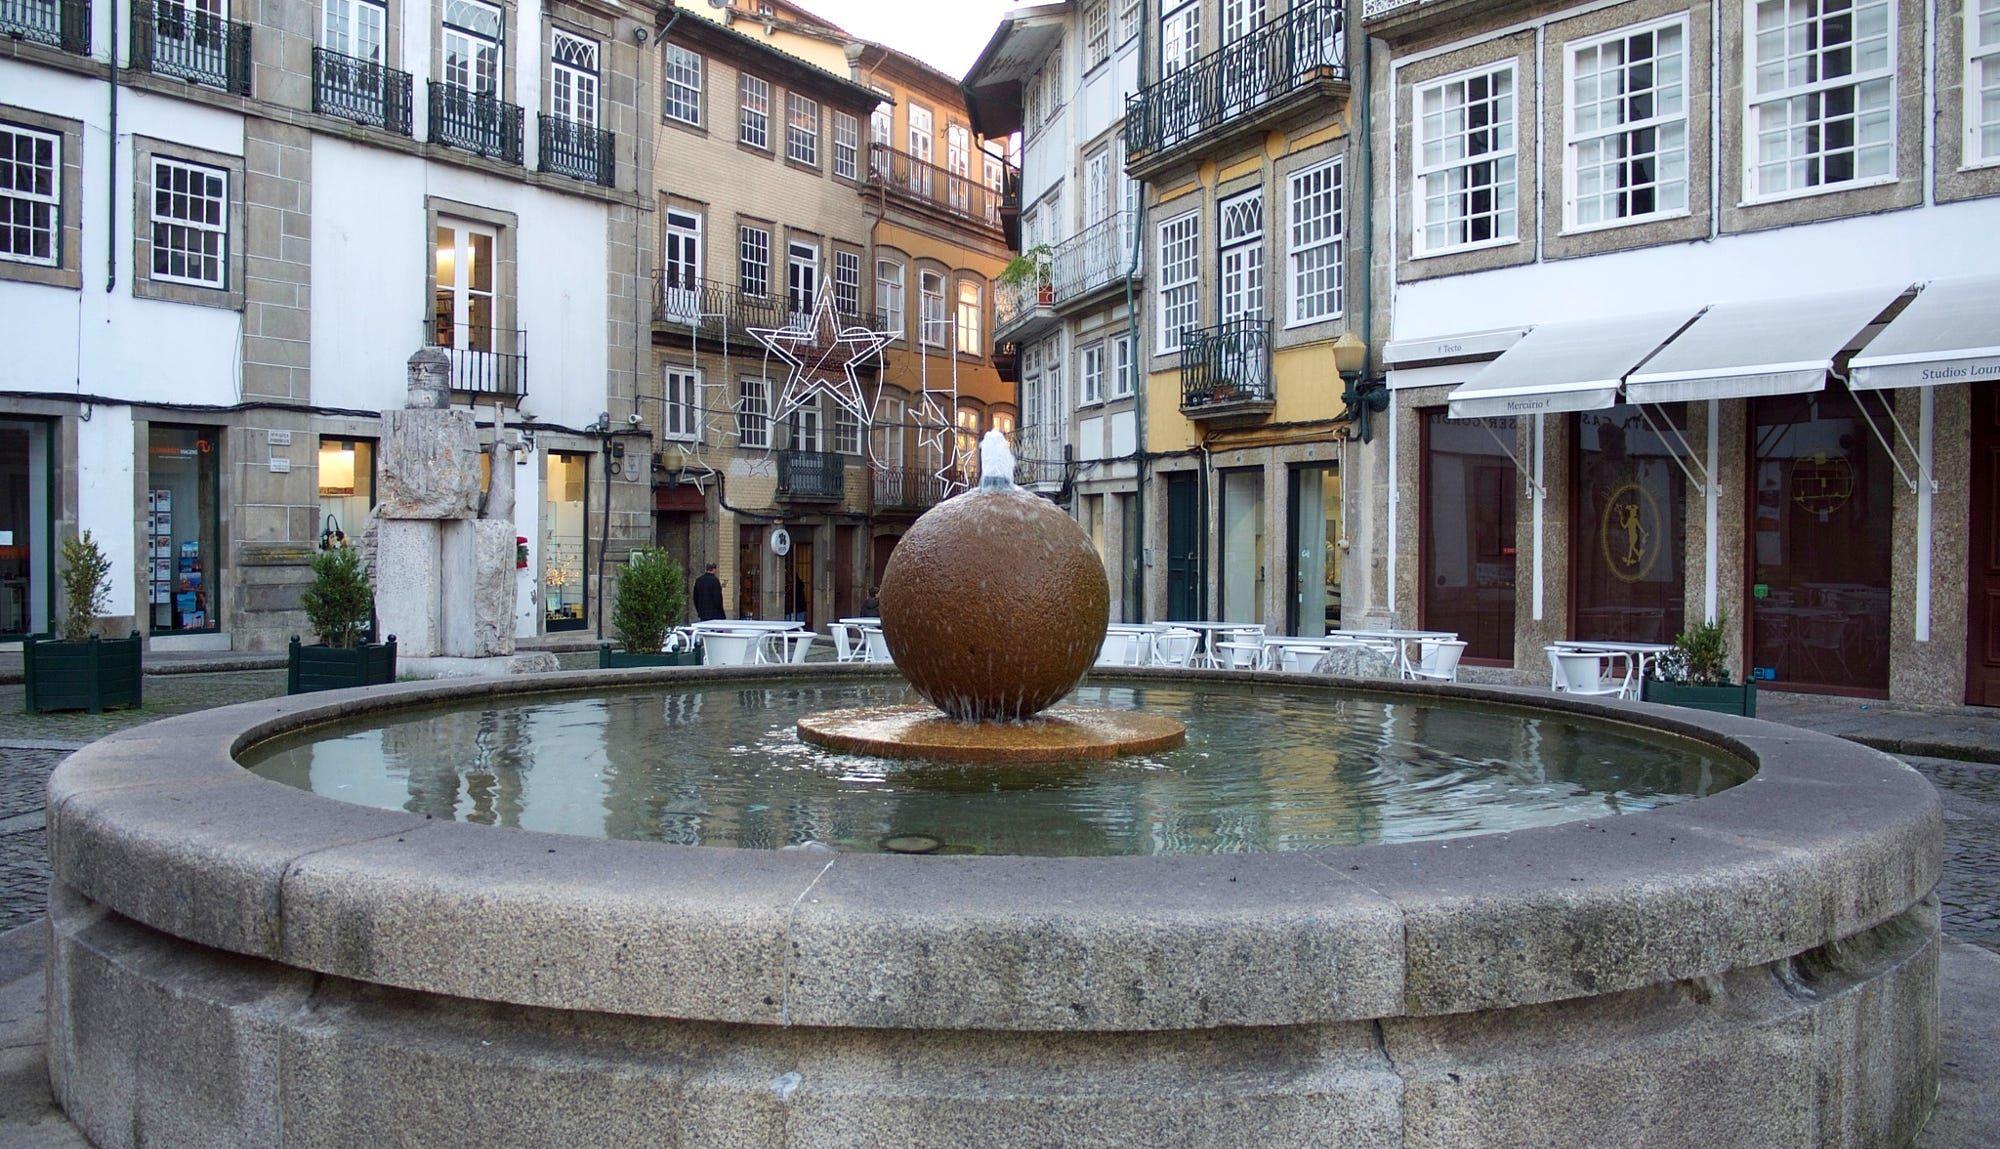 Urban Exploration: Largo João Franco by teresasoares1 https://t.co/MxlR6nP2R4 | #500px #photography #photos https://t.co/qTKNR1eY1X #foll #photography